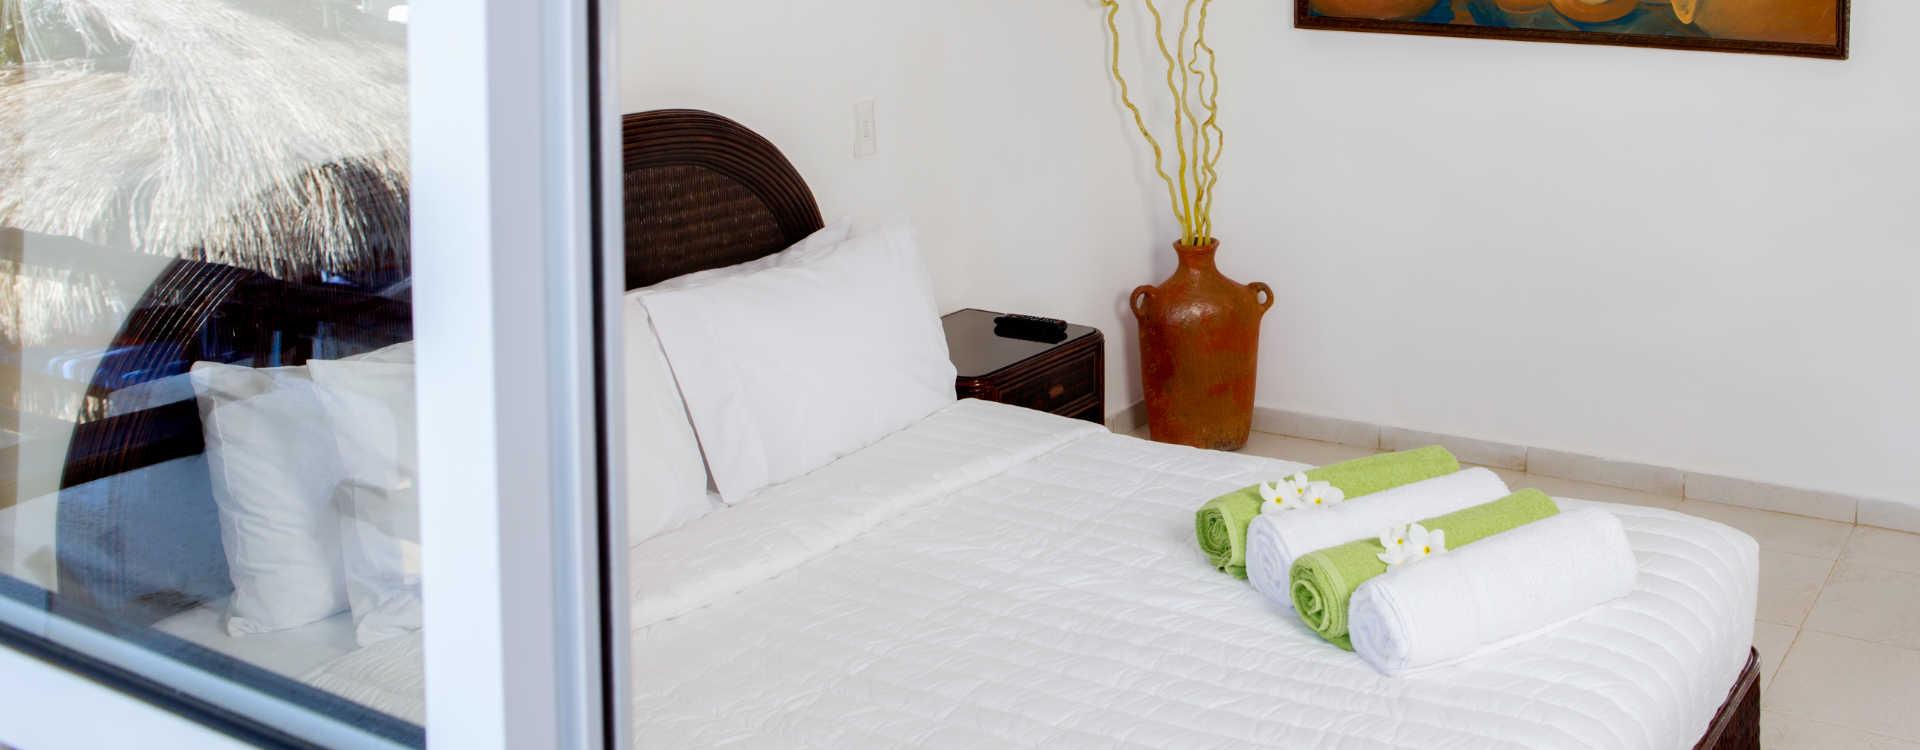 Hotel Palm Beach Habitacion Doble